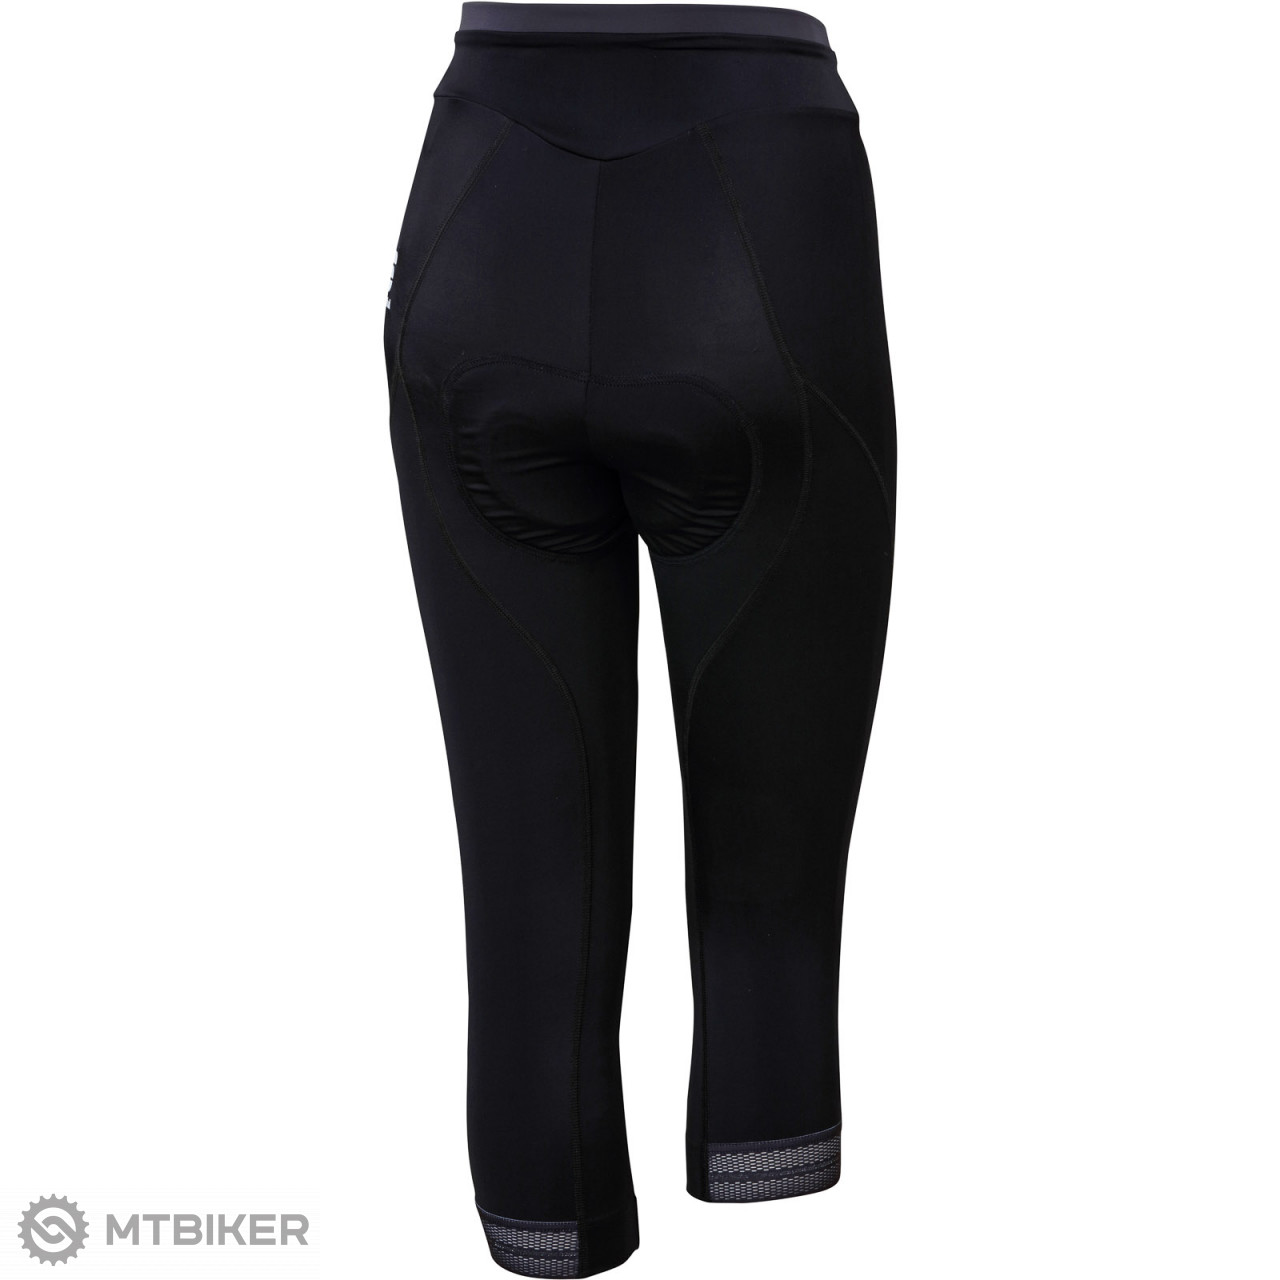 678e87d2a590 Sportful Giro dámske 3 4 nohavice čierne - MTBIKER Shop